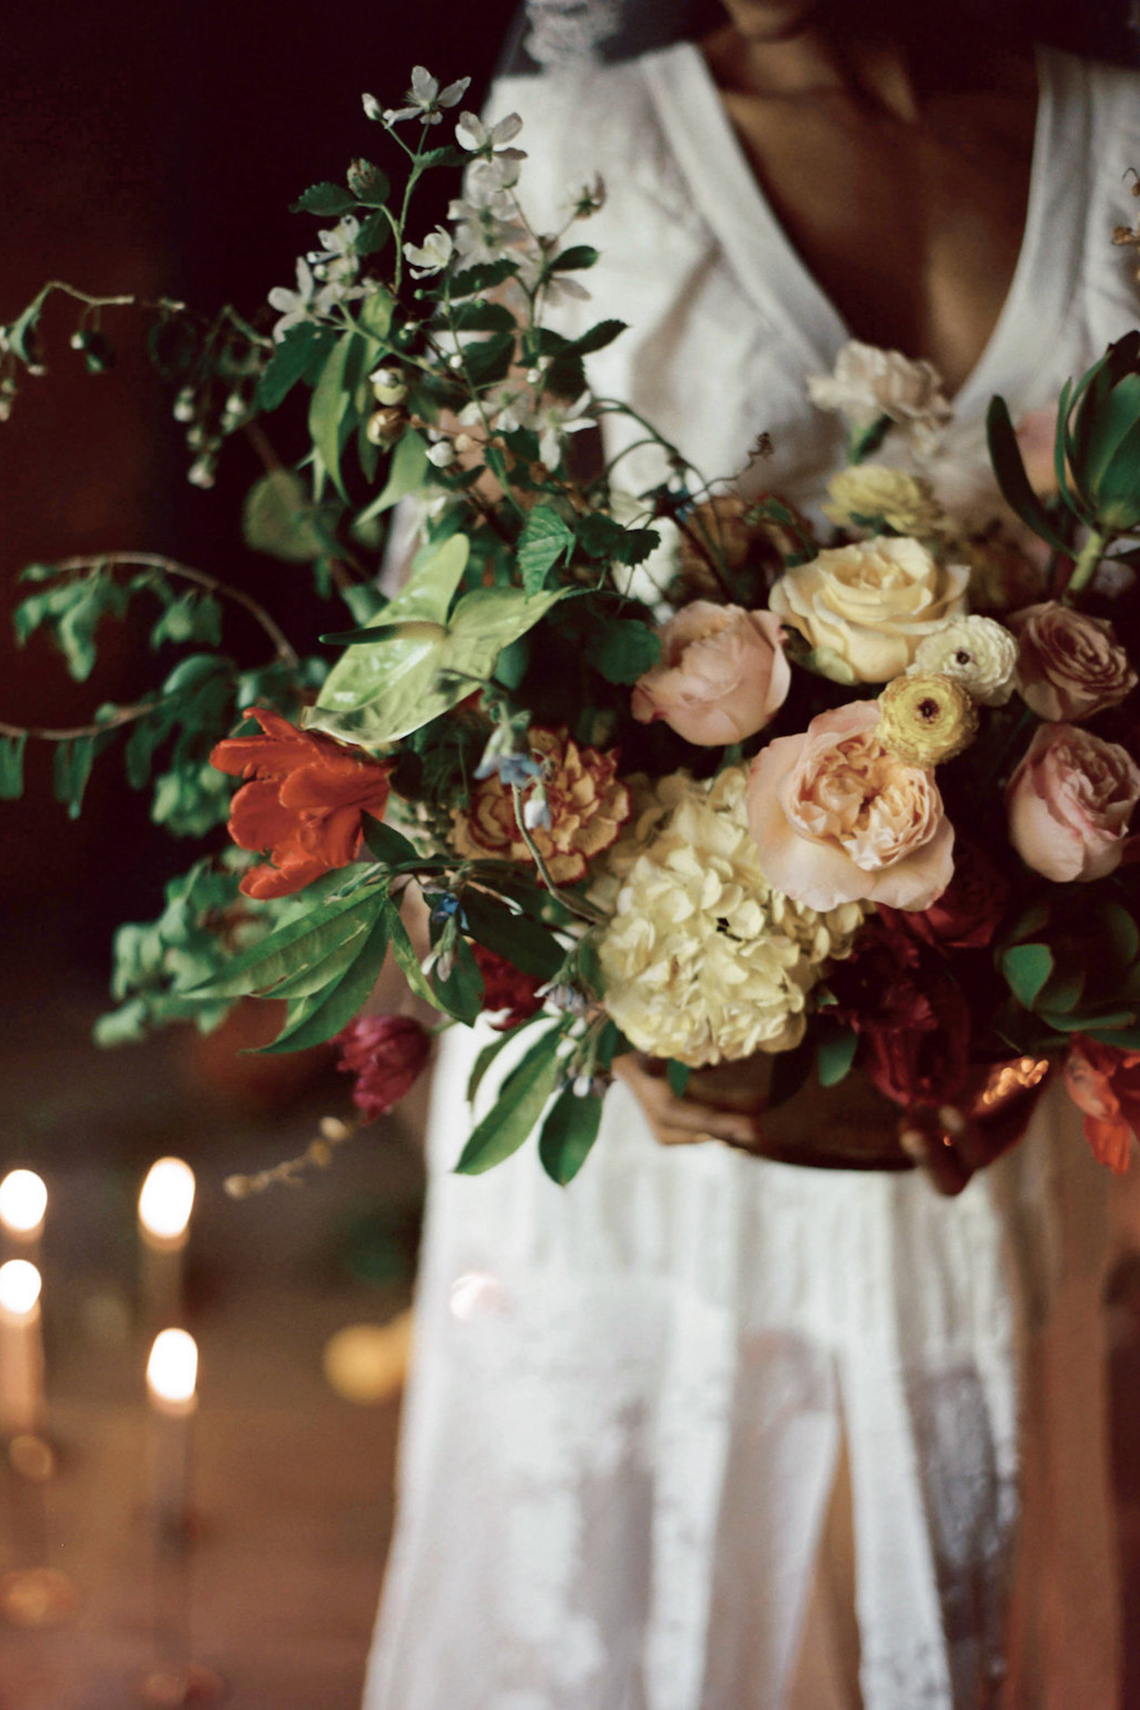 Romantic Candlelit Wedding Inspiration Full of Drama | Megan Wynn 19